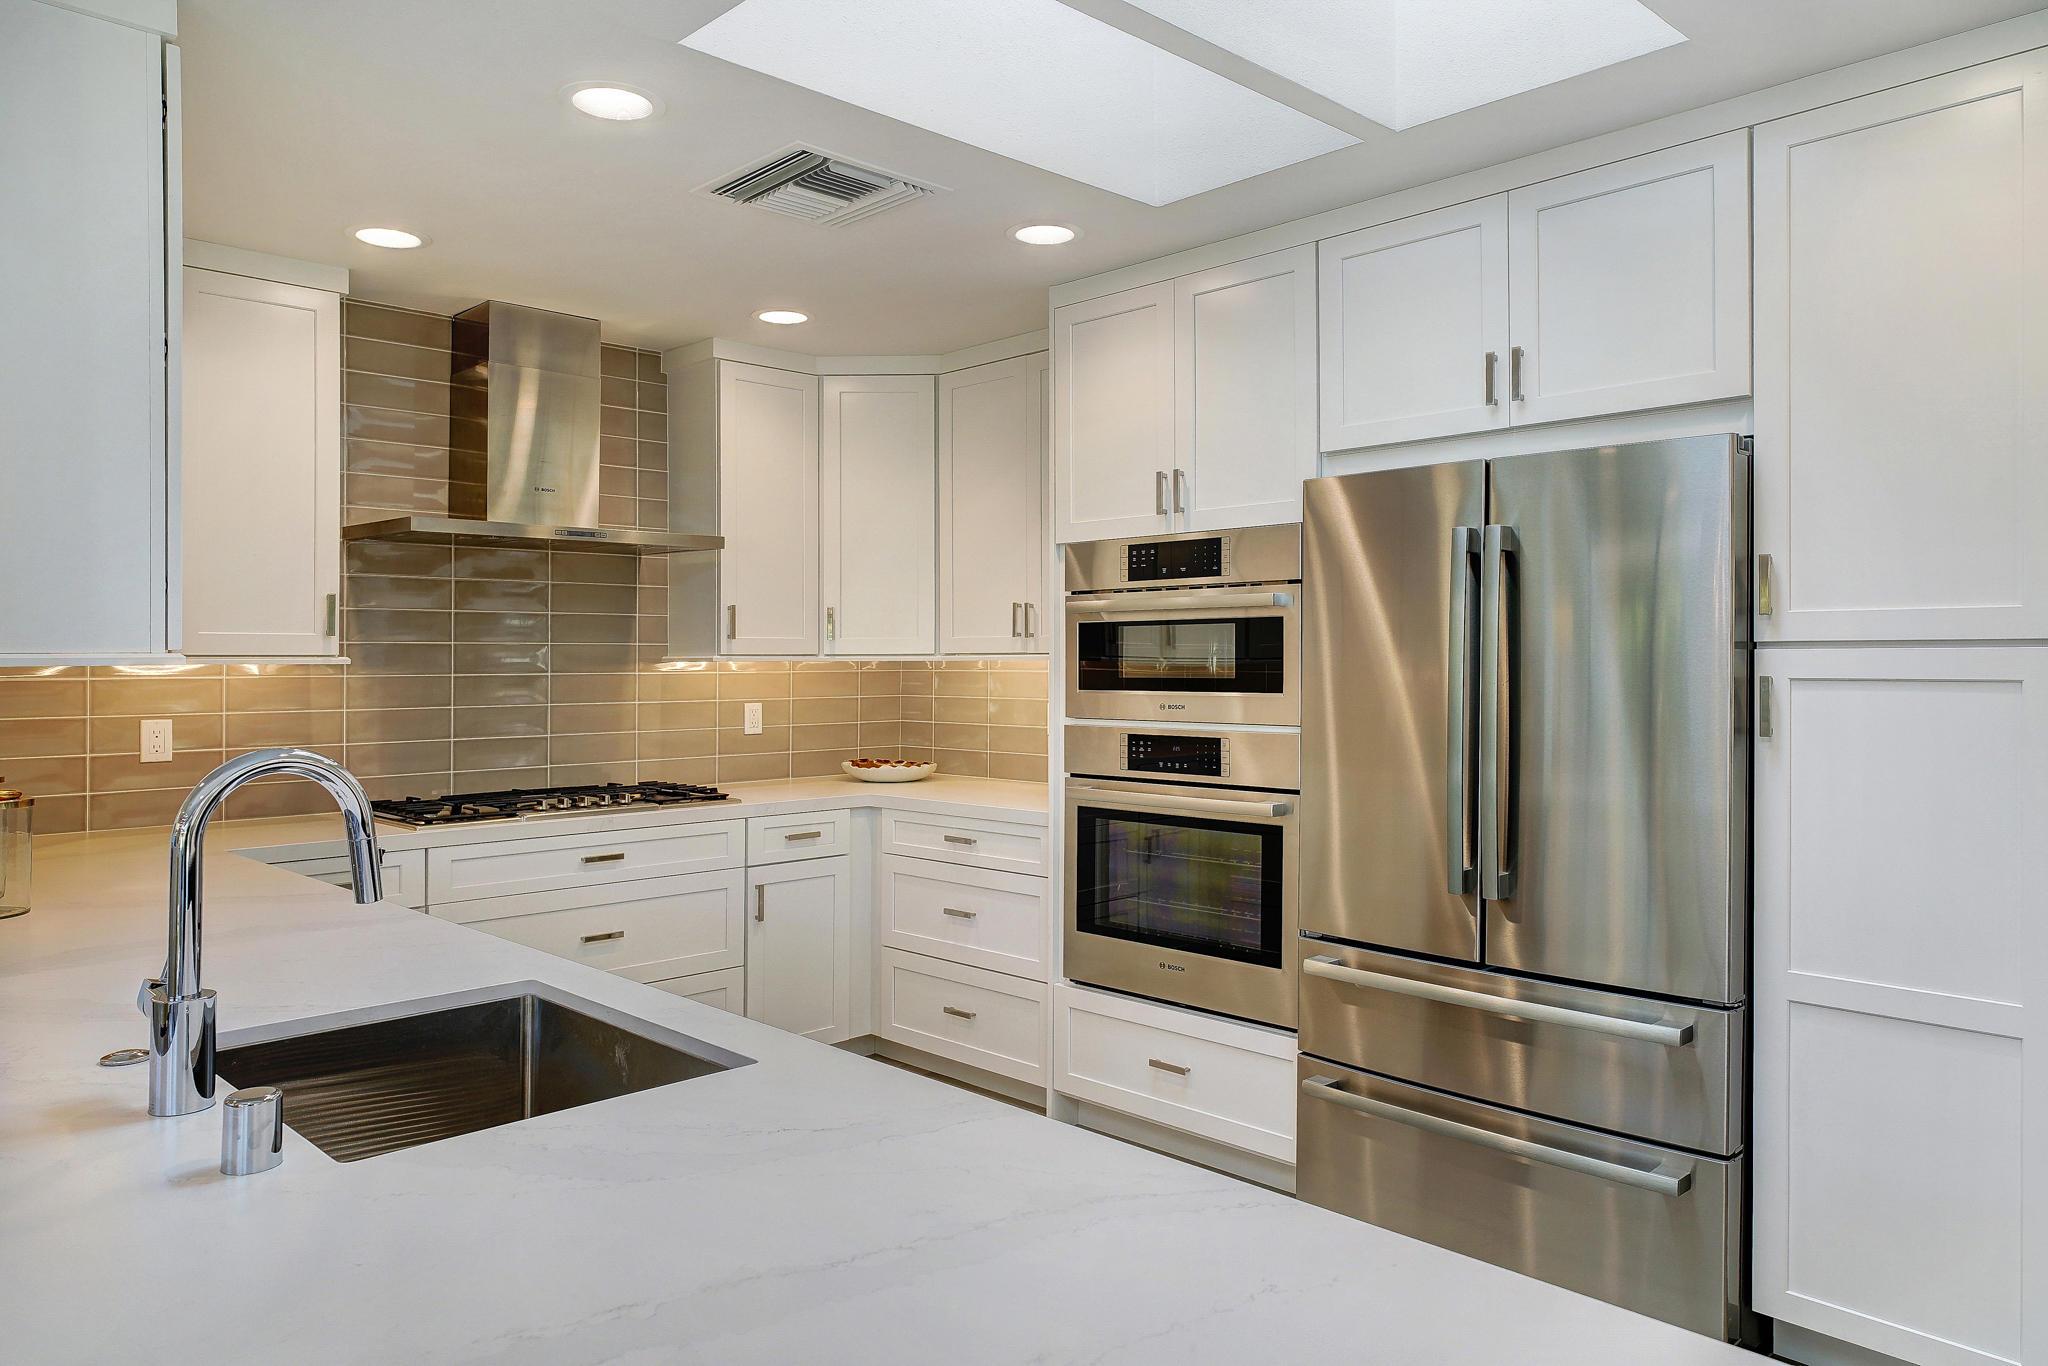 50 Princeton Drive, Rancho Mirage, California 92270, 3 Bedrooms Bedrooms, ,3 BathroomsBathrooms,Residential,For Sale,50 Princeton Drive,219038951